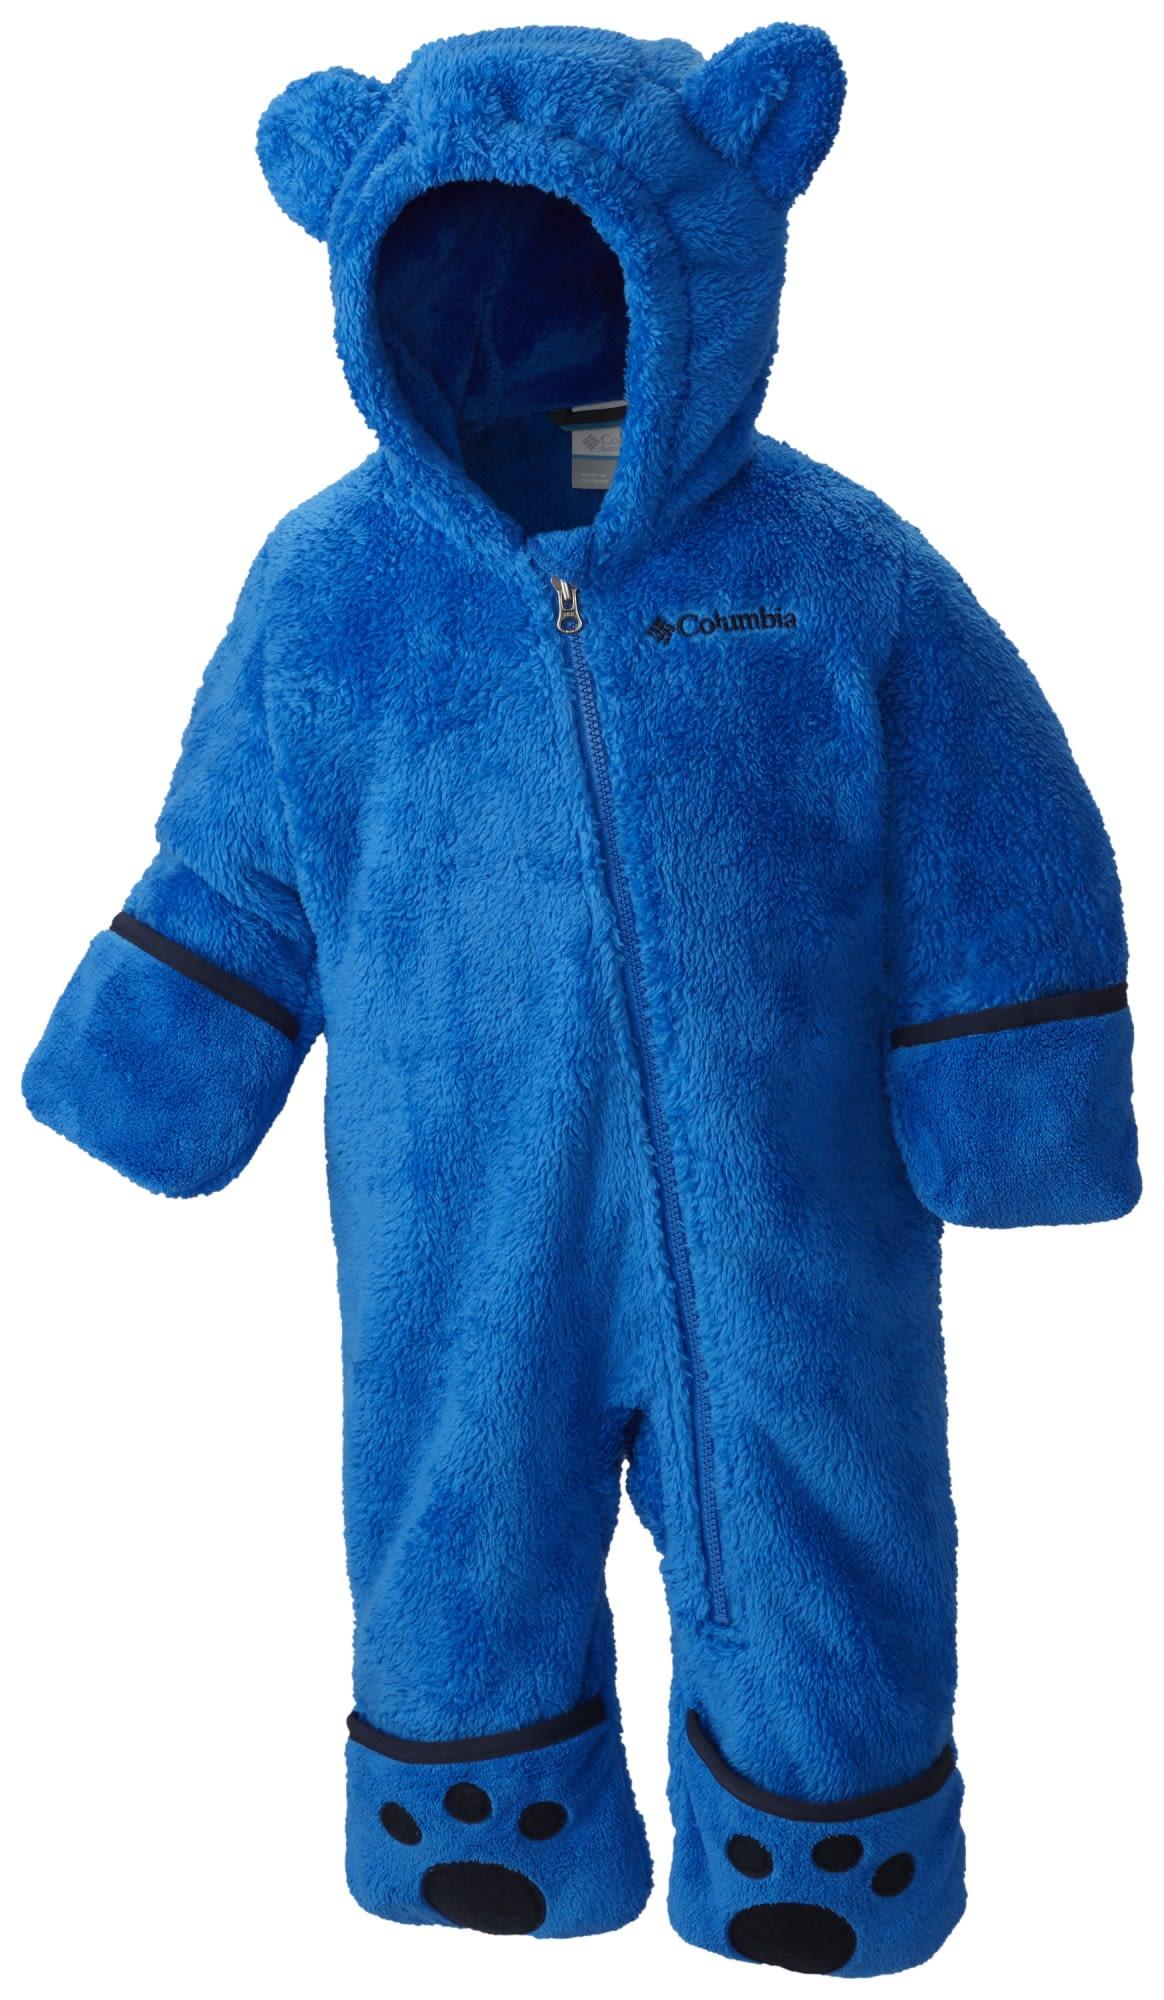 Columbia Foxy Baby II Bunting Blau, Hose, 18-24M